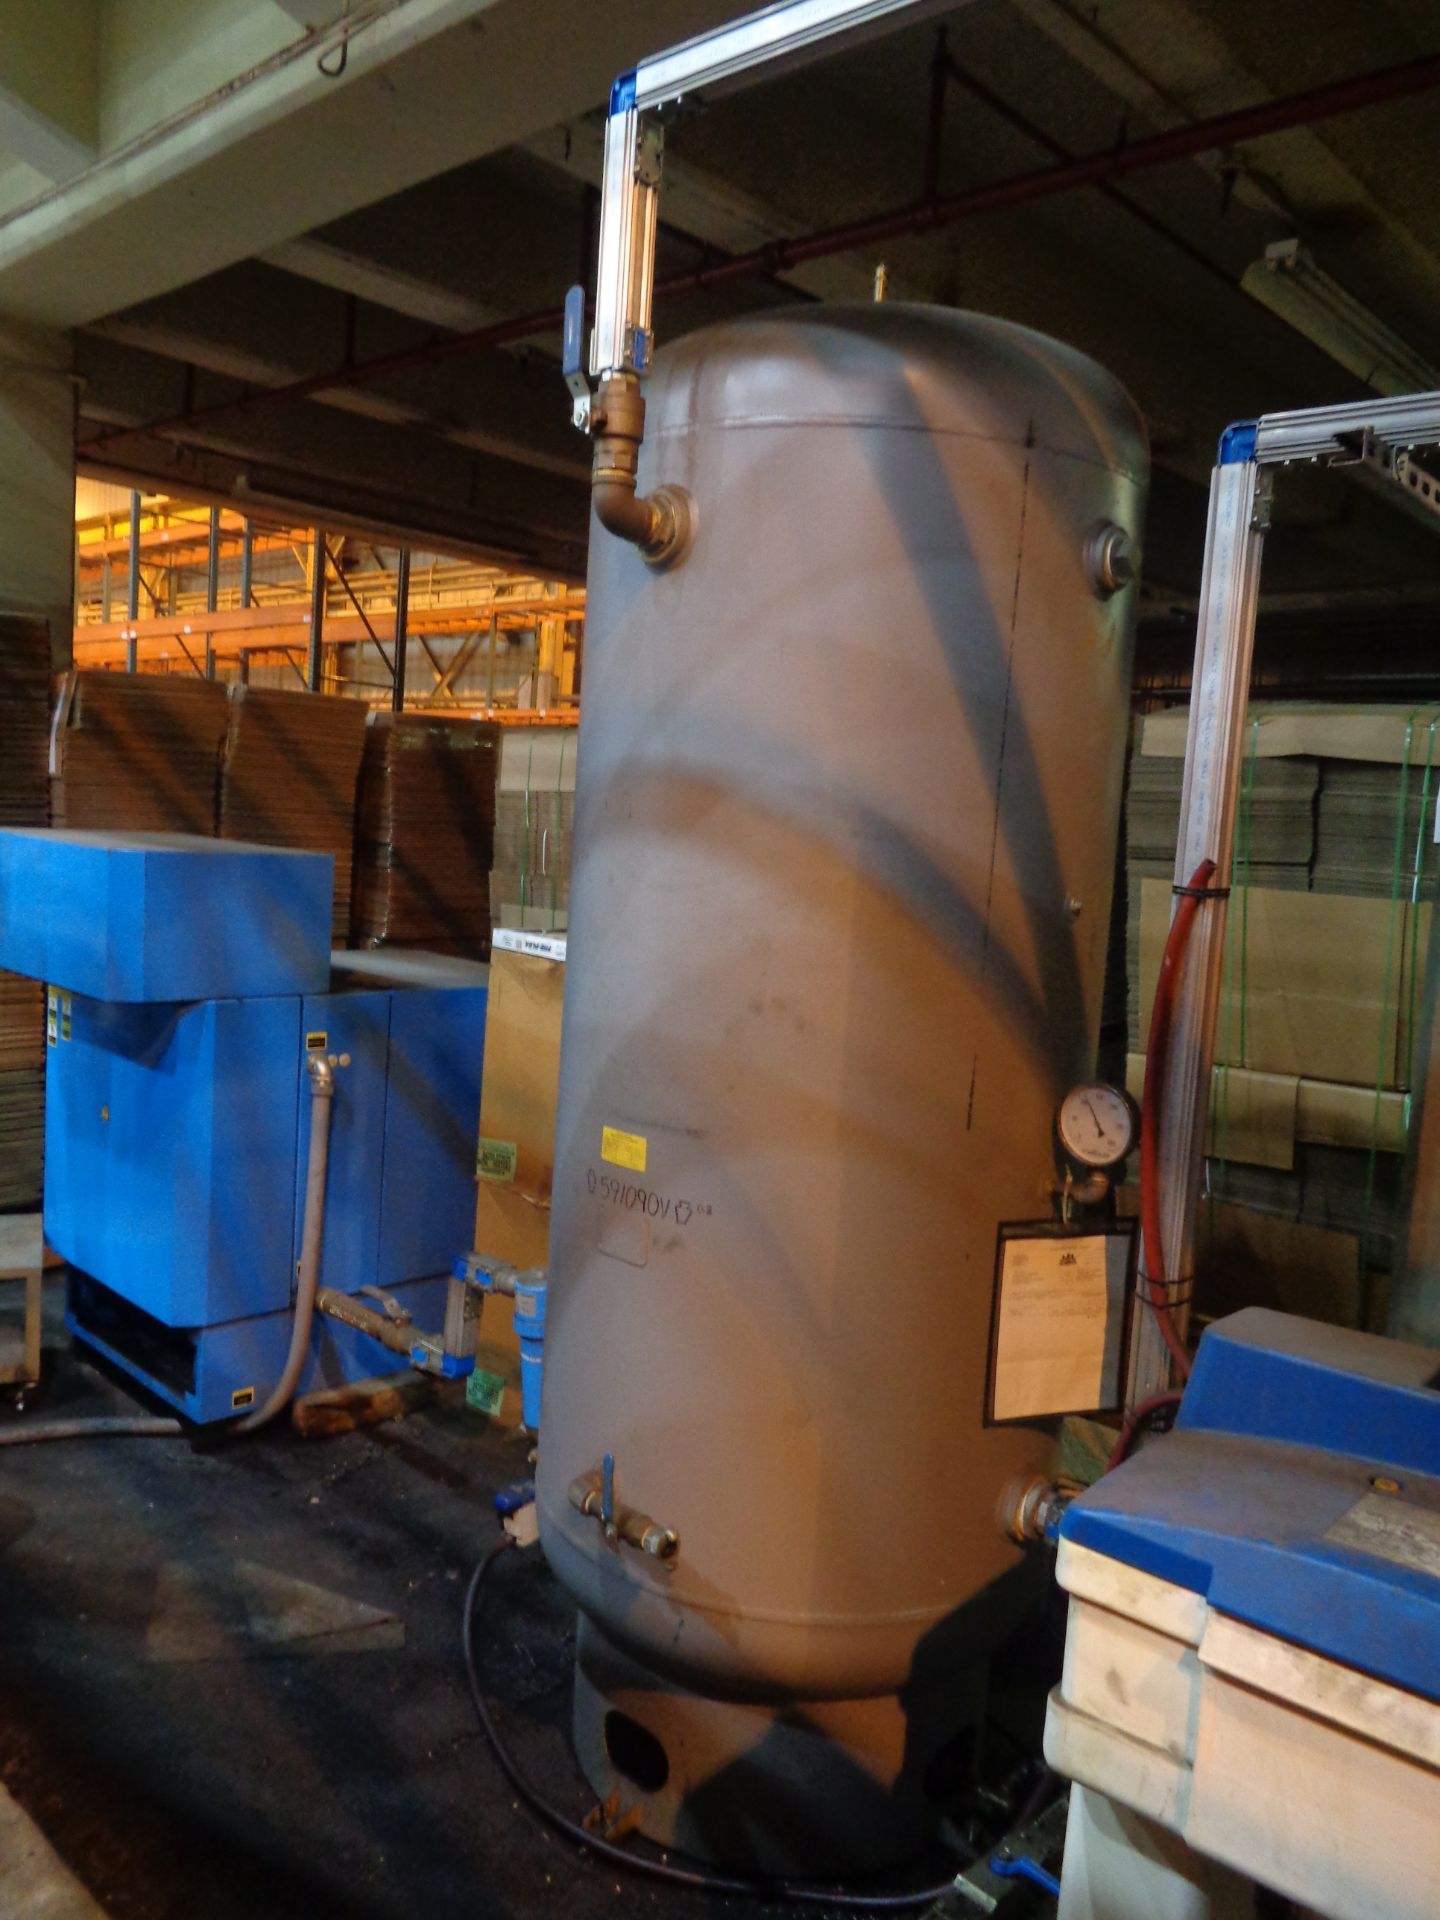 Boge Compressor and Tank - Image 2 of 5